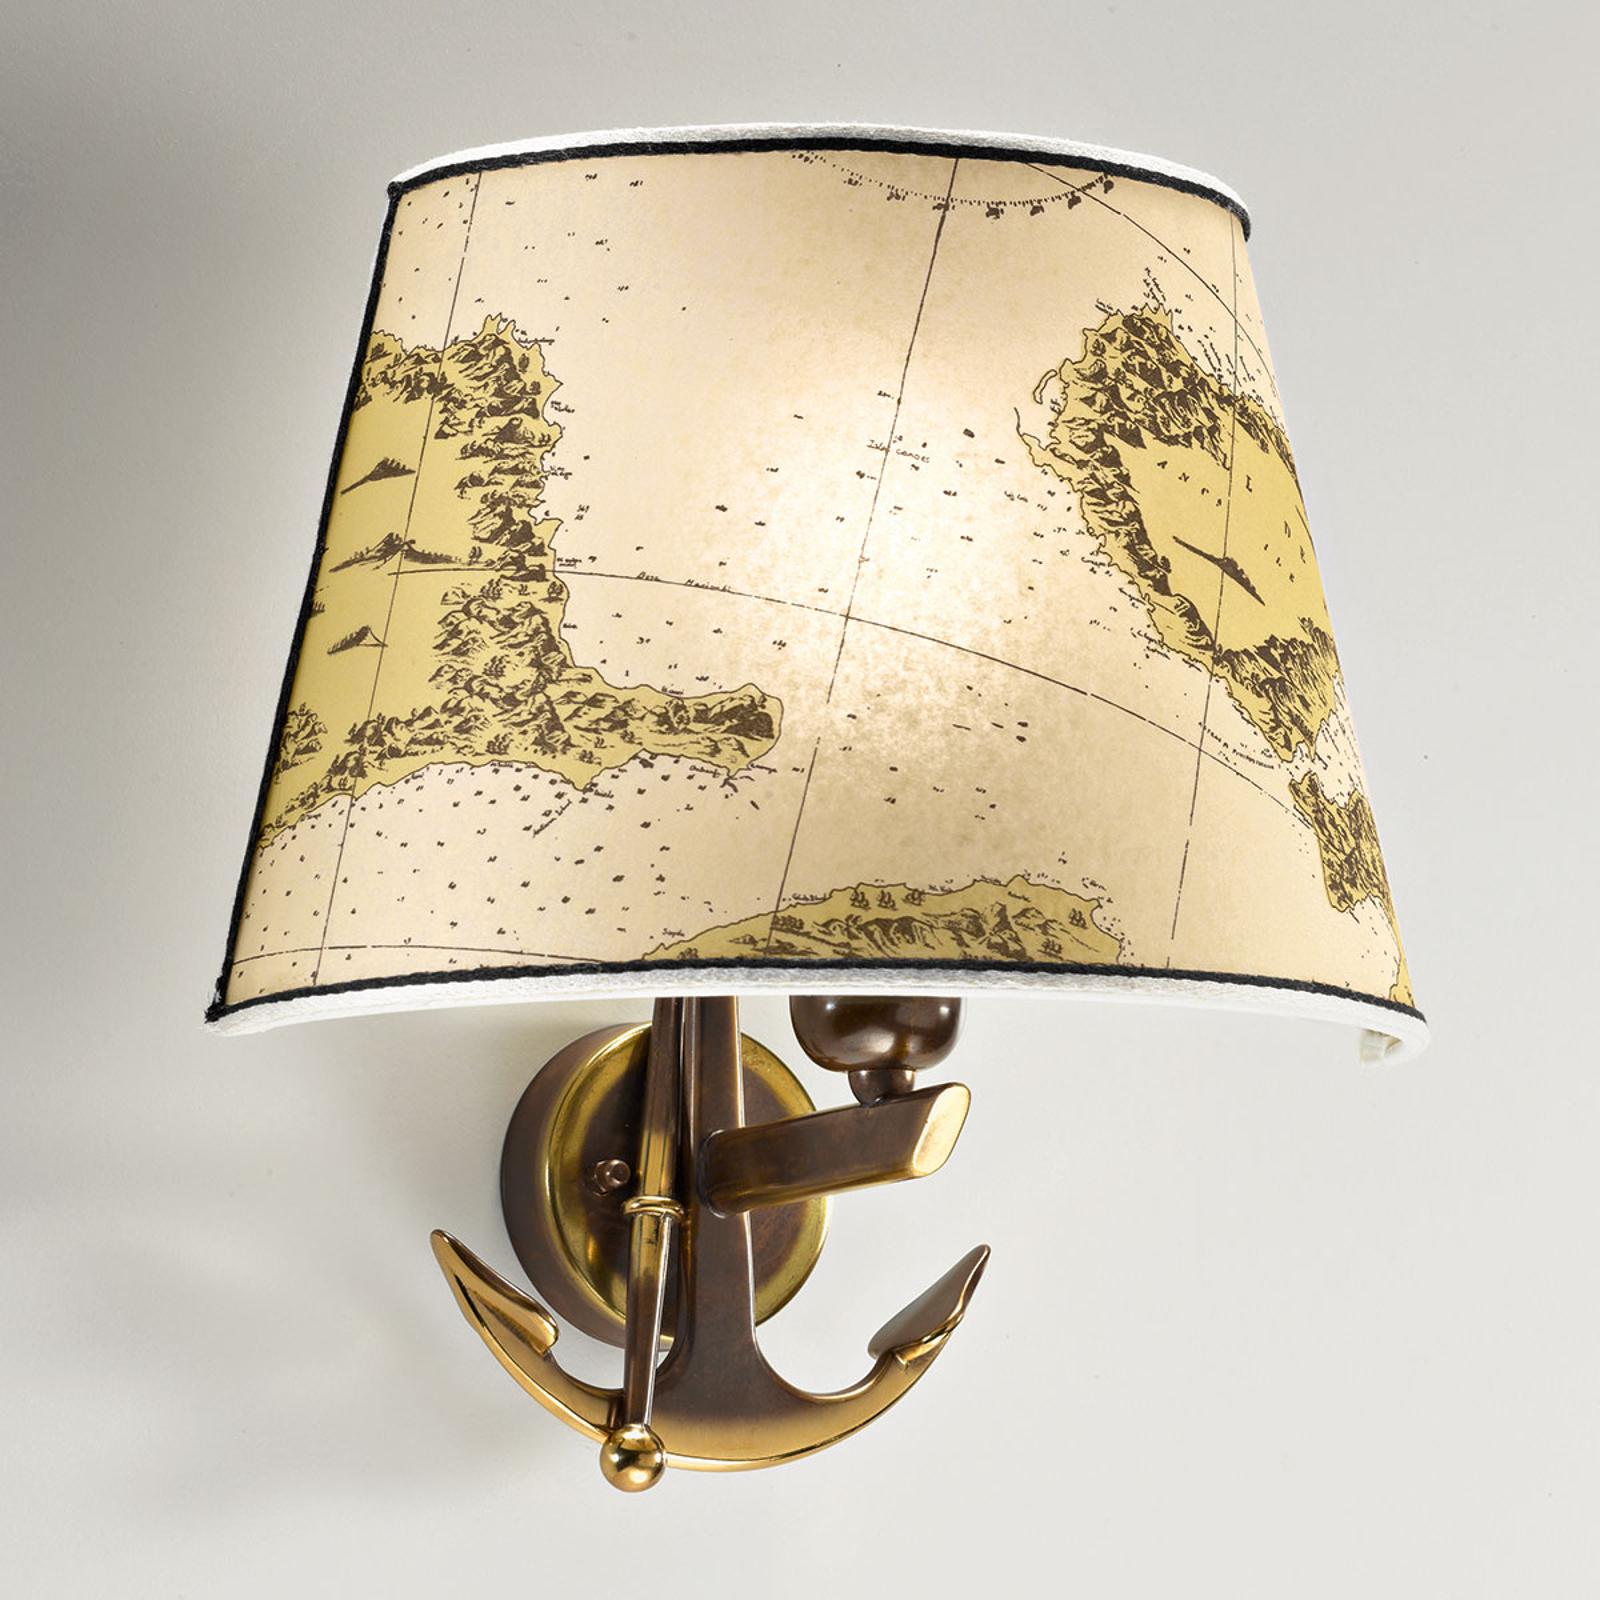 Nautica væglampe, 1 lyskilde, 31 cm